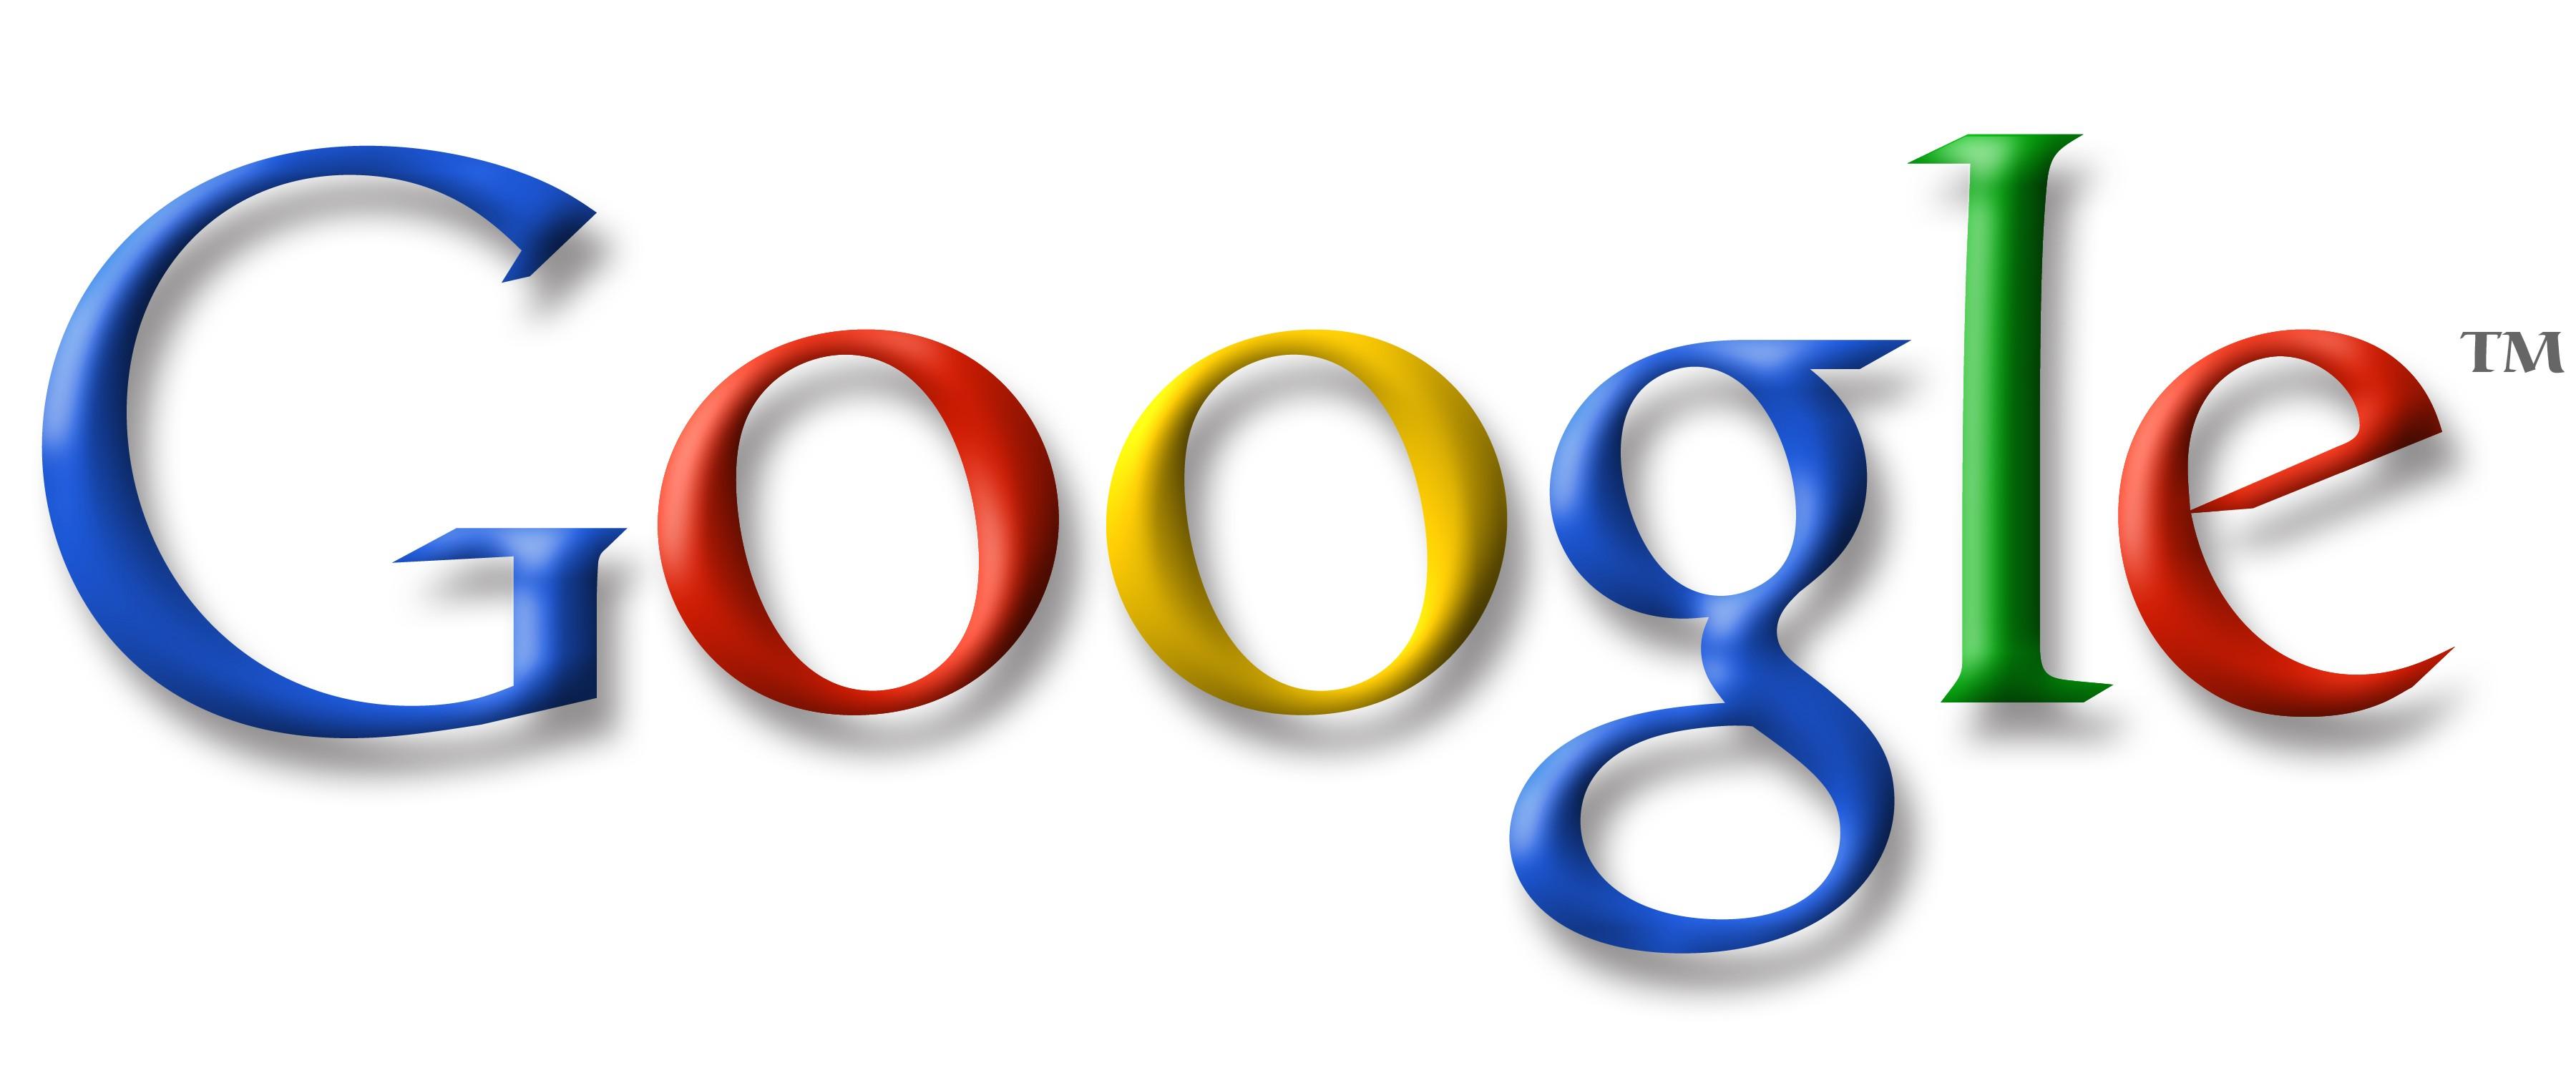 google logo Google ha incluído a España en la lista de países censores de Internet, y era previsible